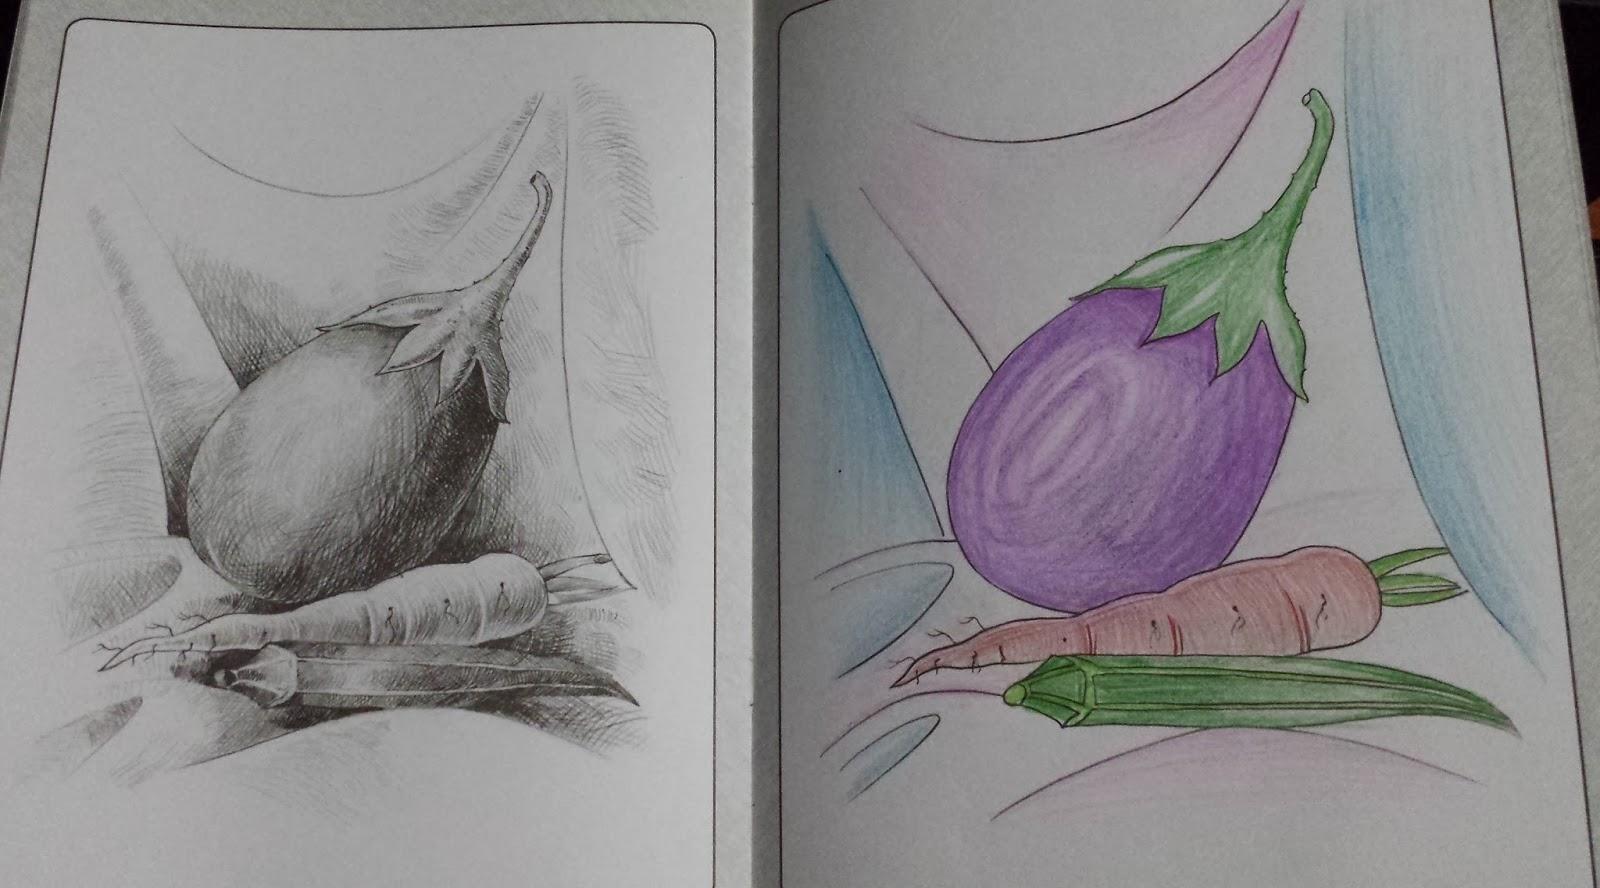 Easy Pencil Shading Drawings